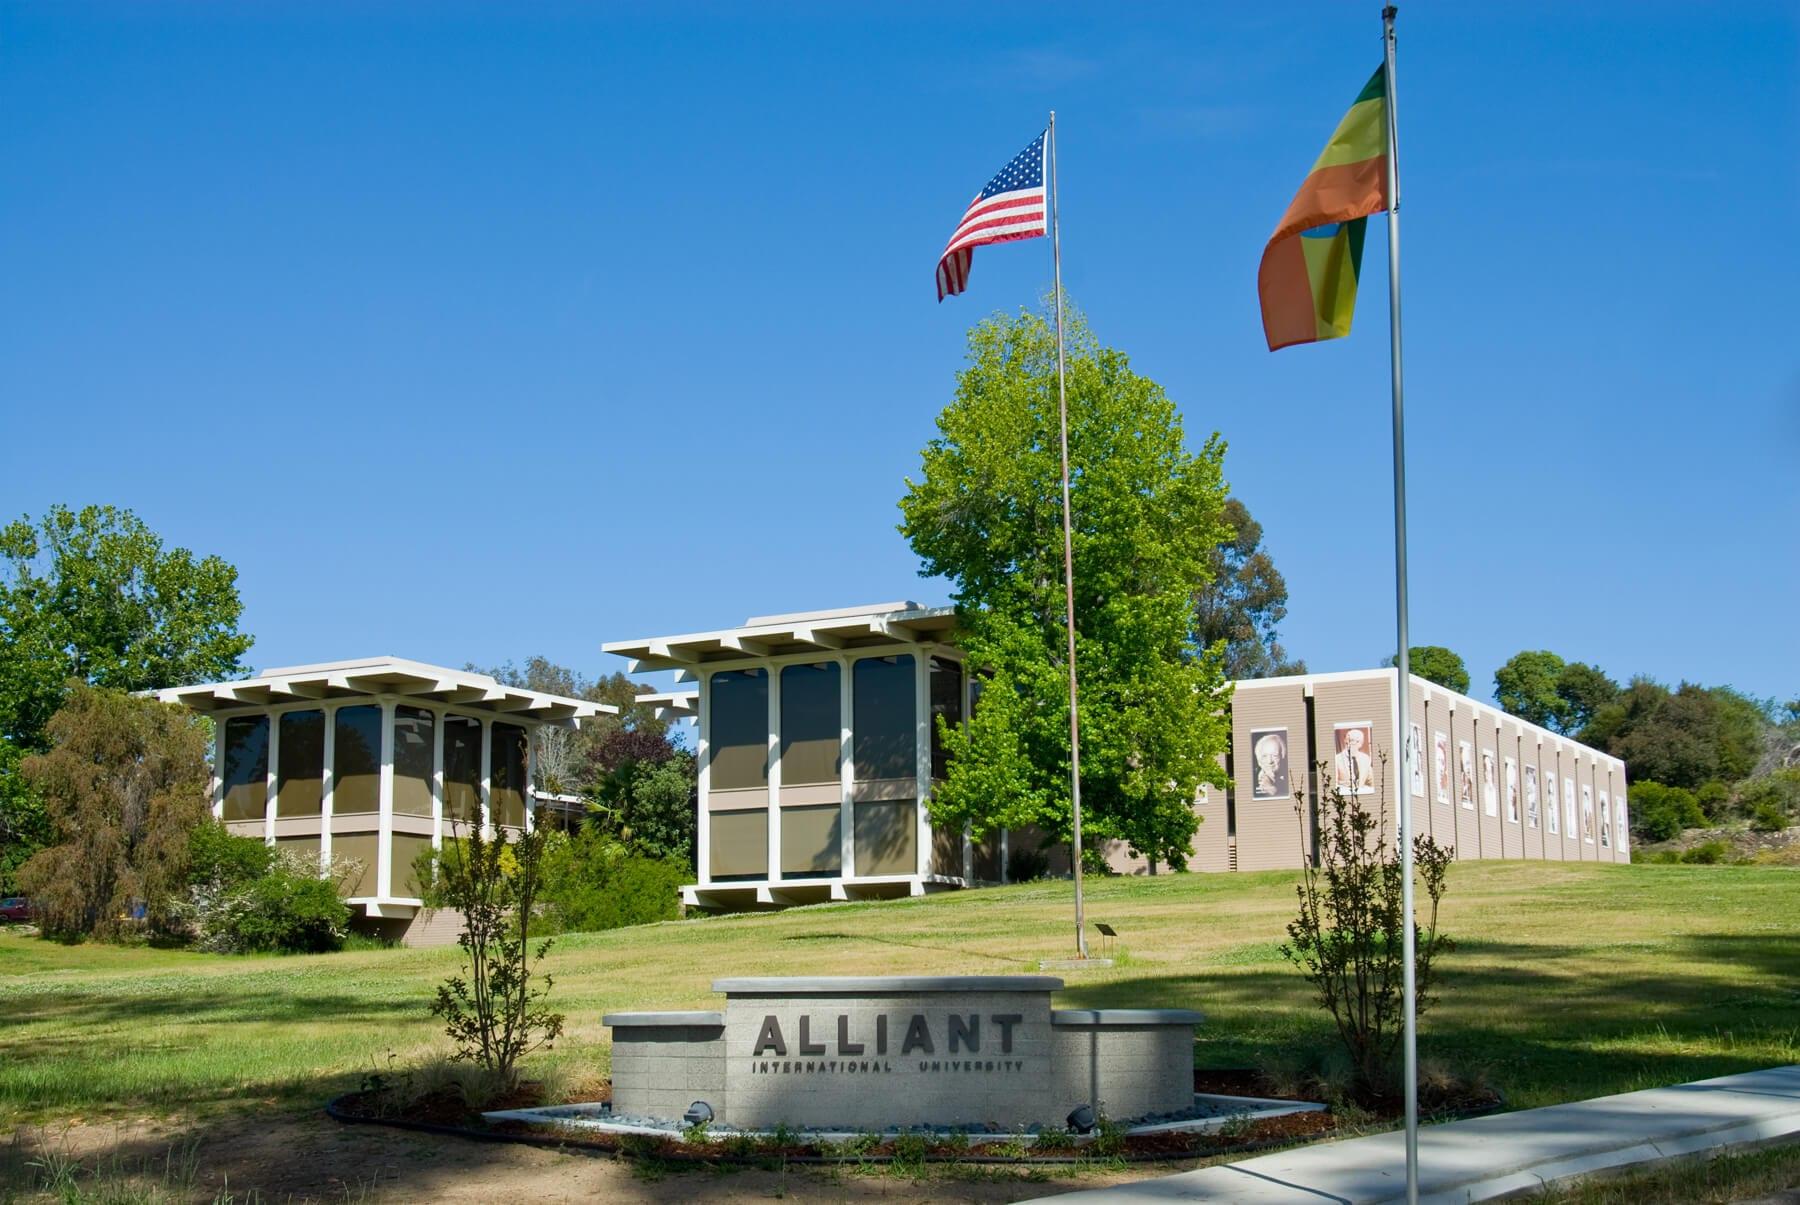 alliant-international-university-online-master-of-arts-in-organizational-psychology